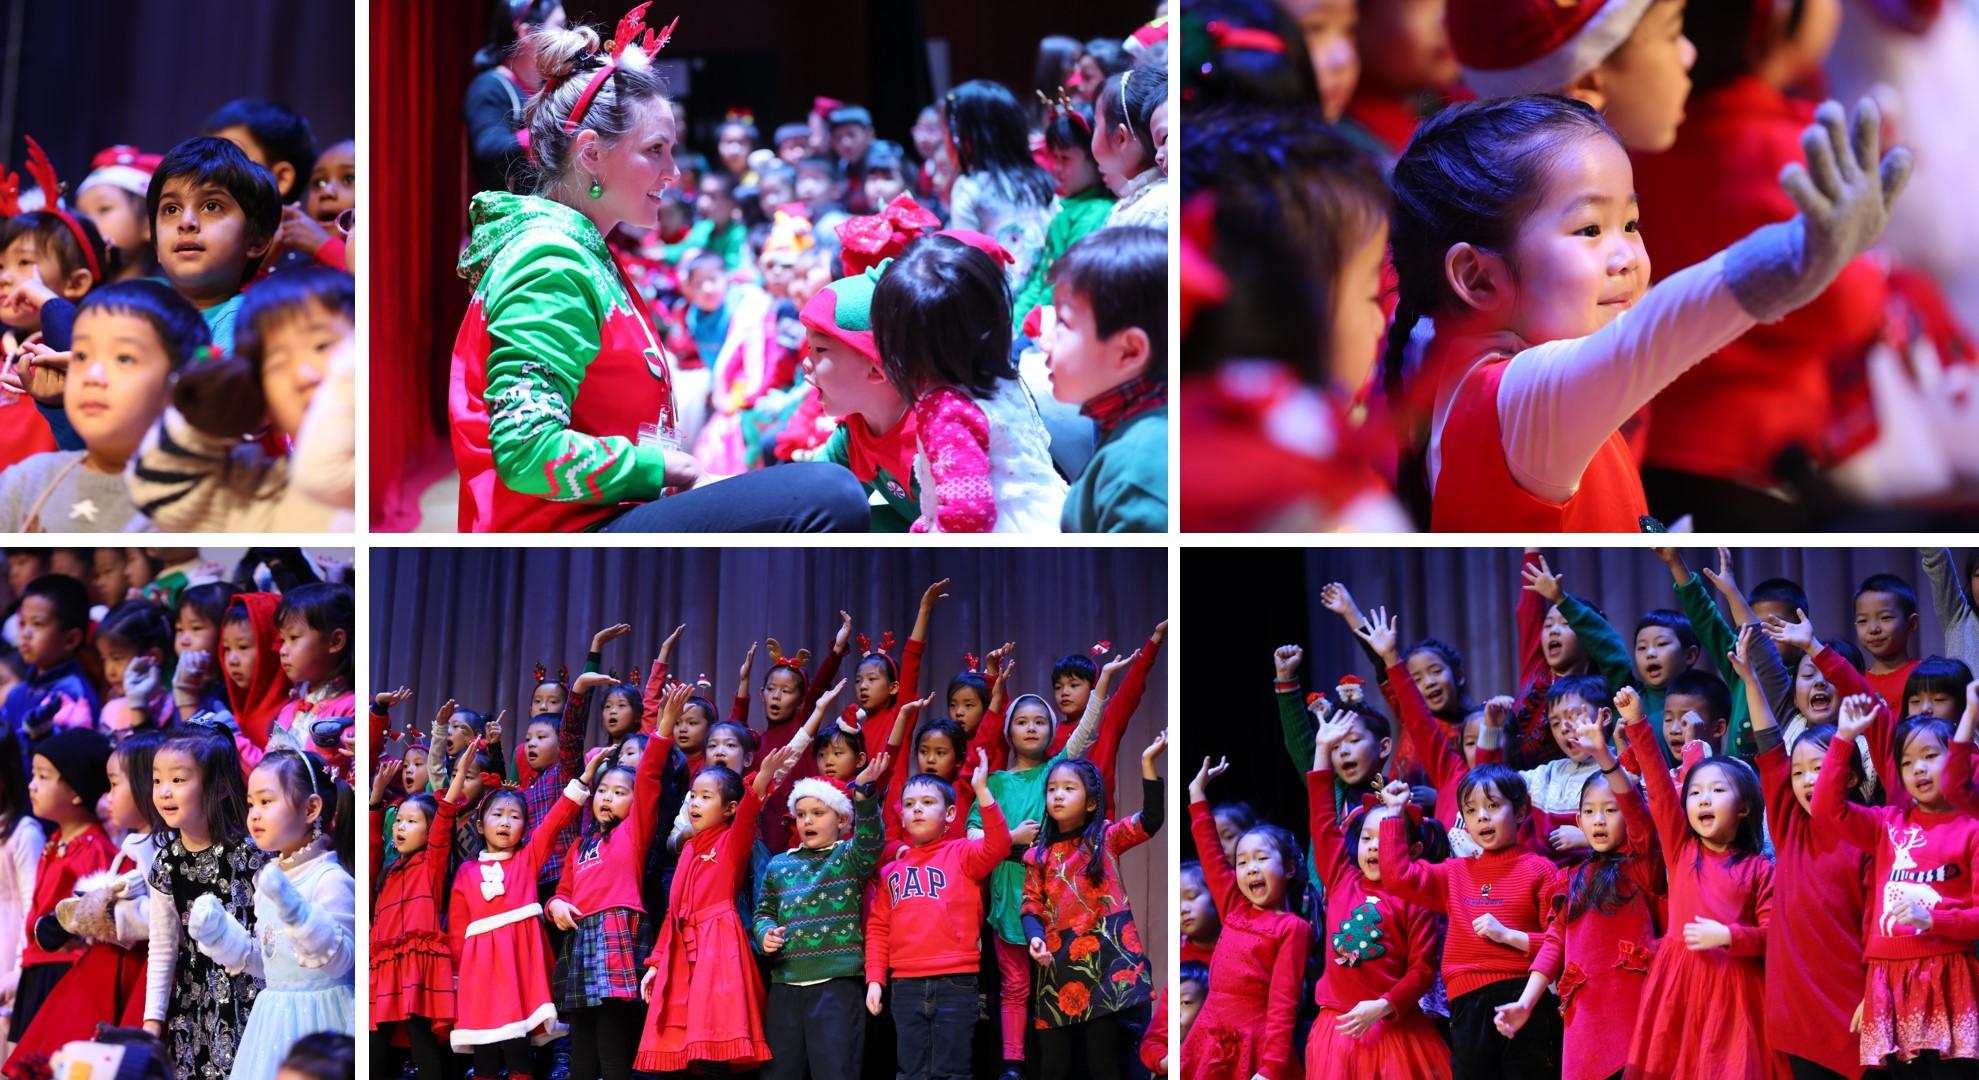 ey-winter-celebration-2019-shows-1-北京德威英国国际学校